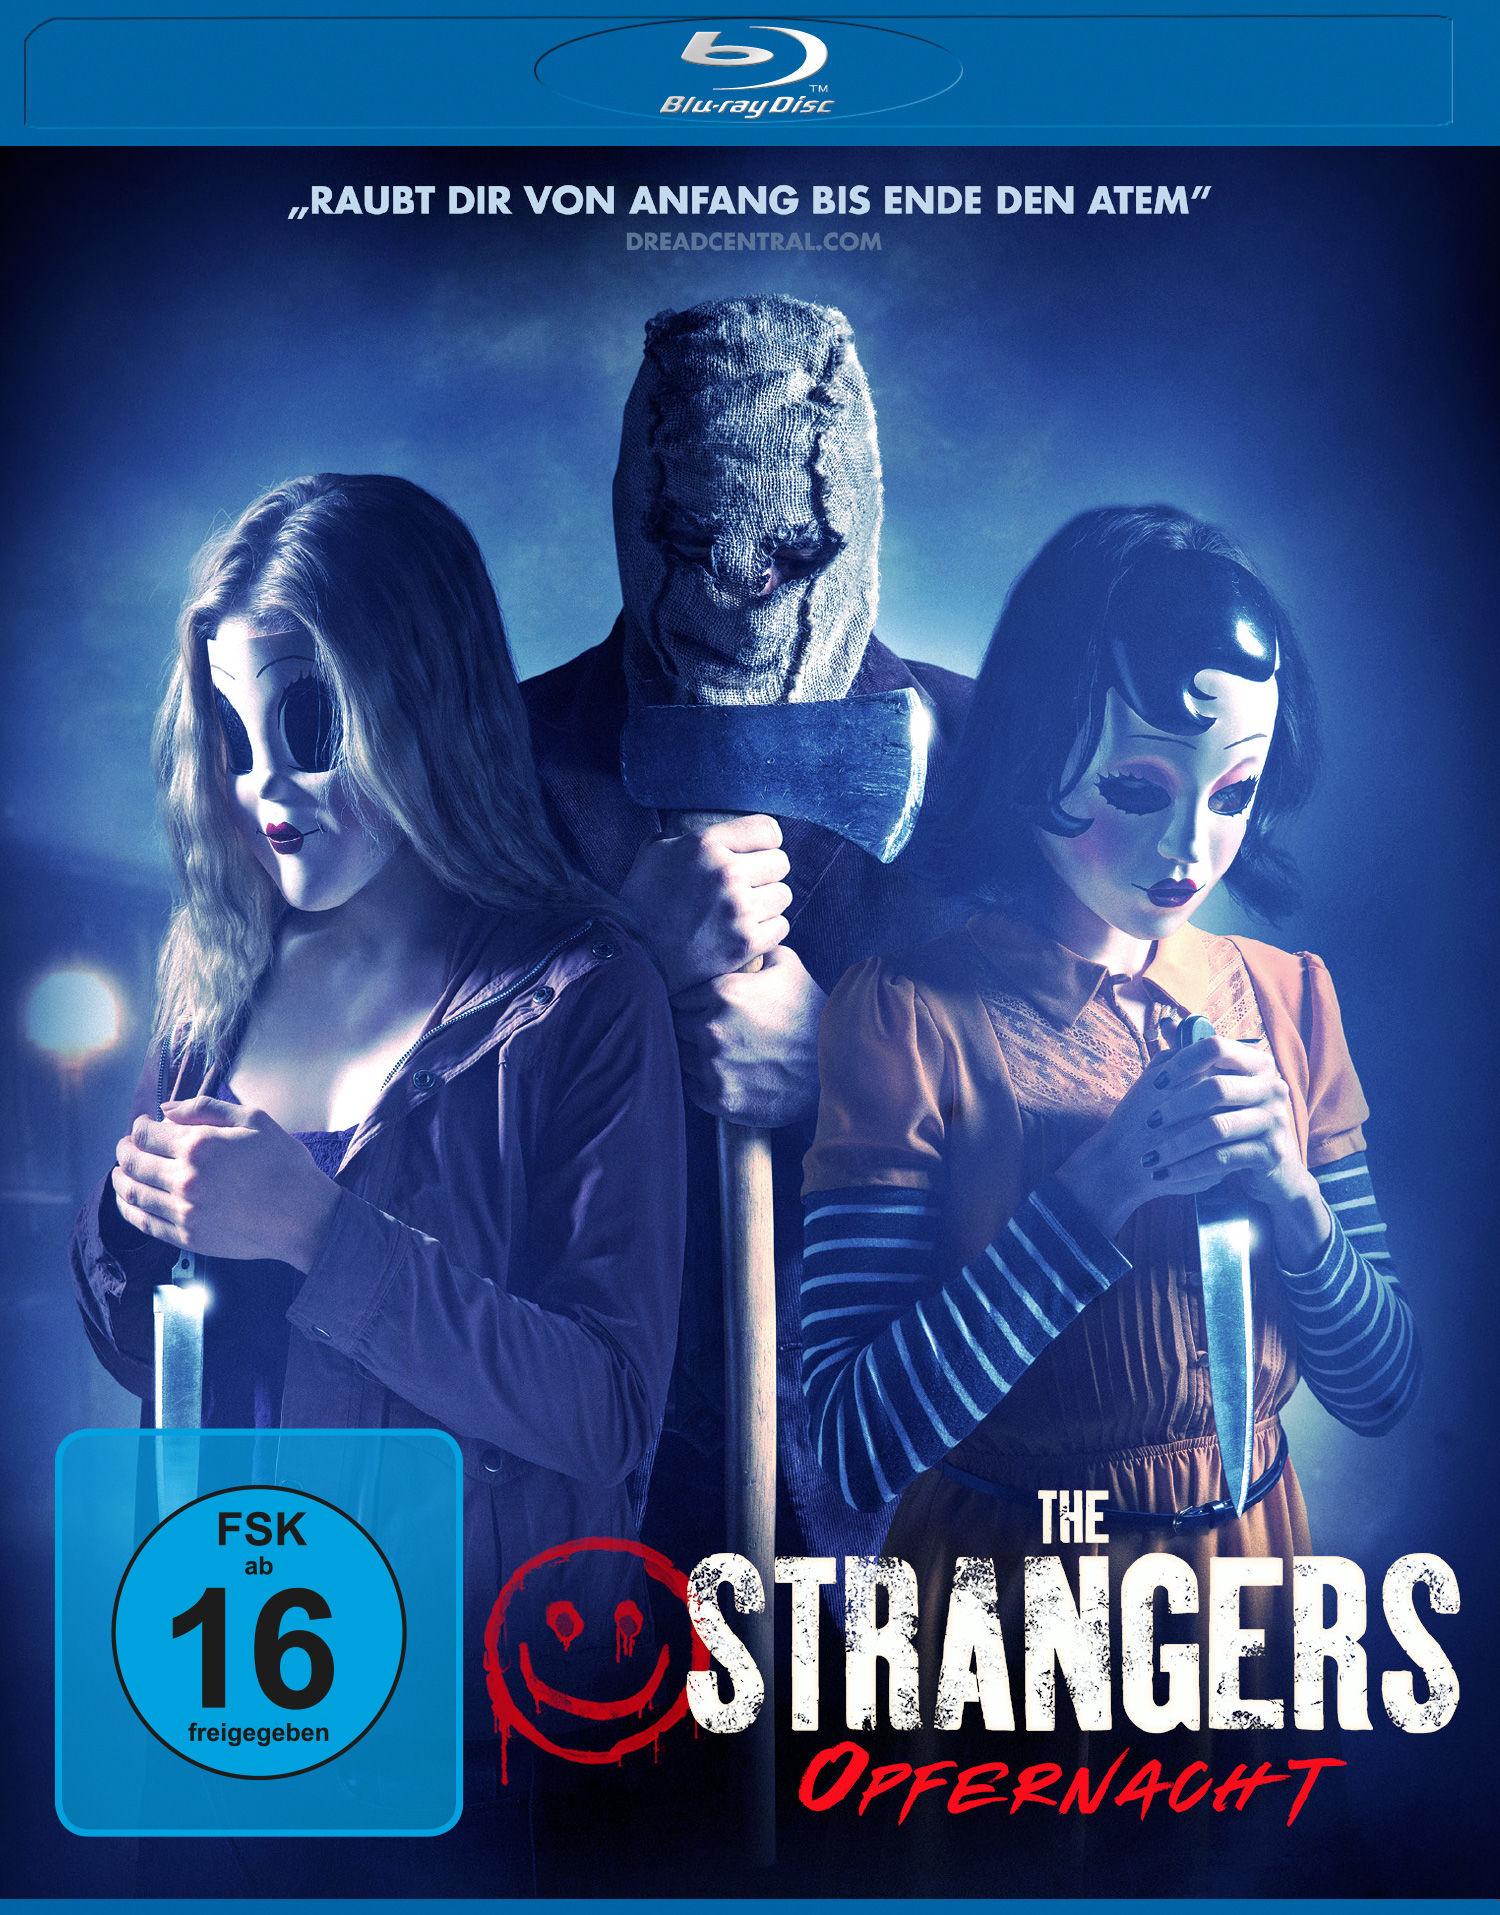 Strangers Opfernacht